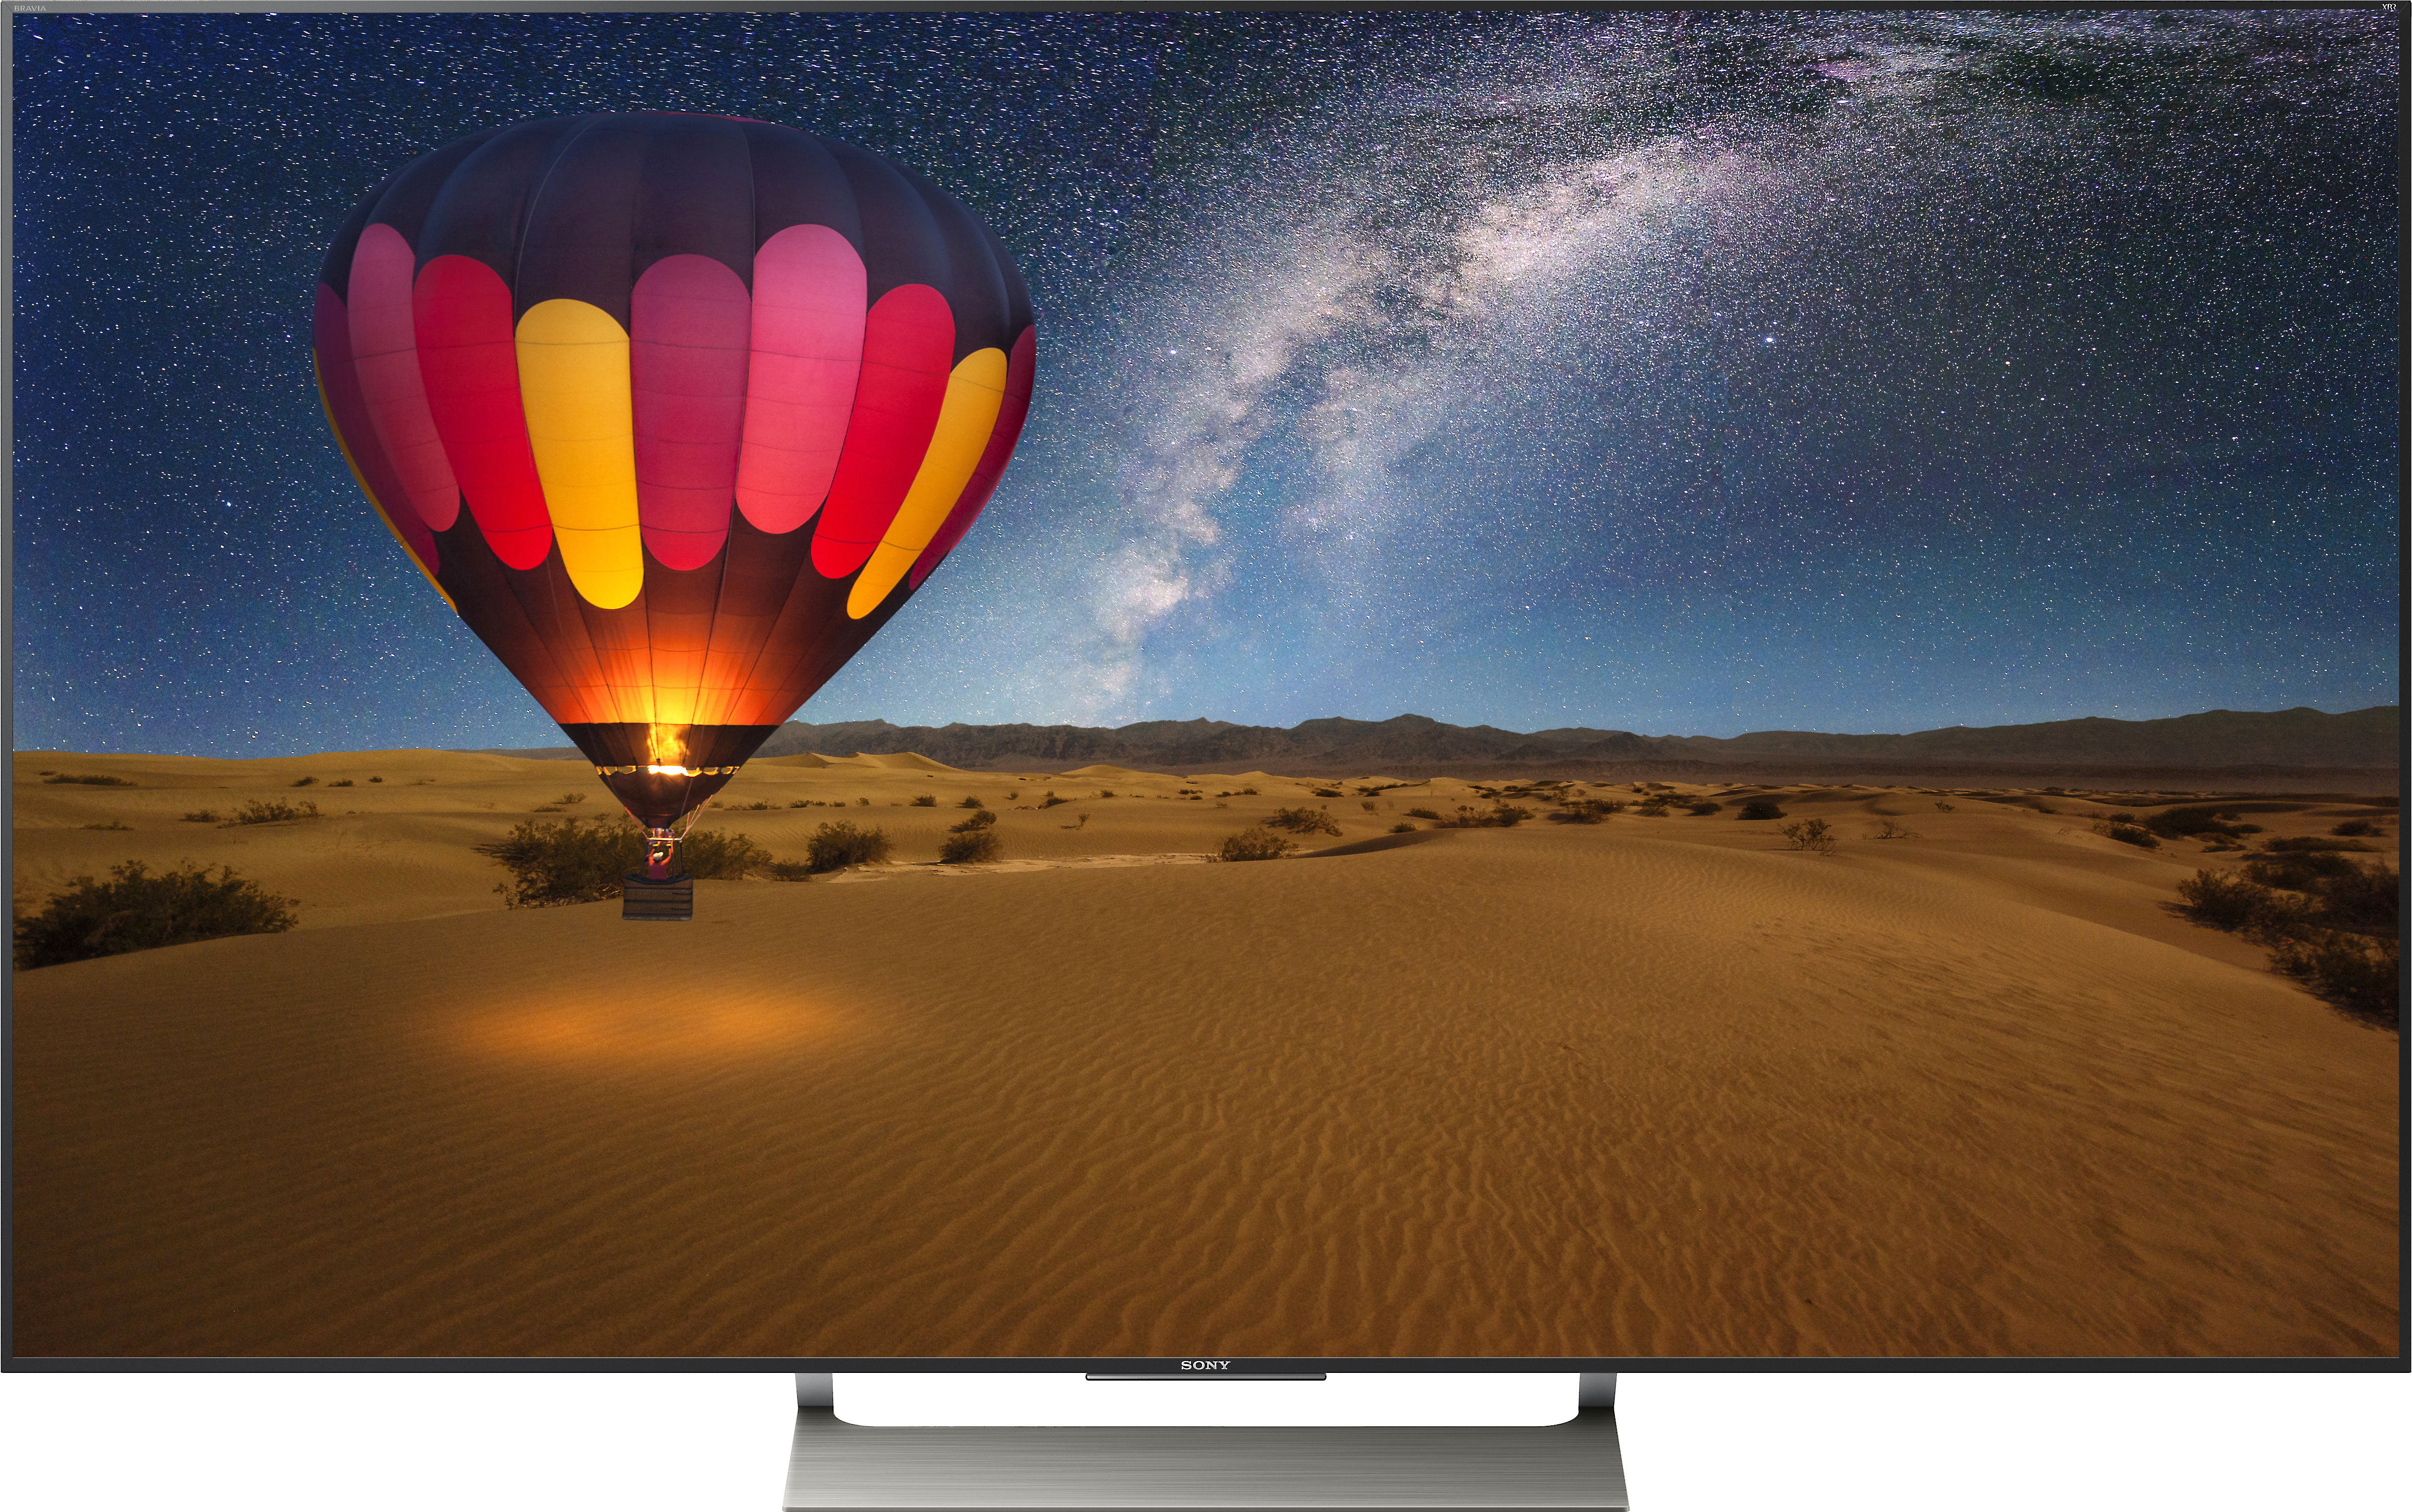 Top 10 Punto Medio Noticias | Sony Xbr75x900e Owners Manual